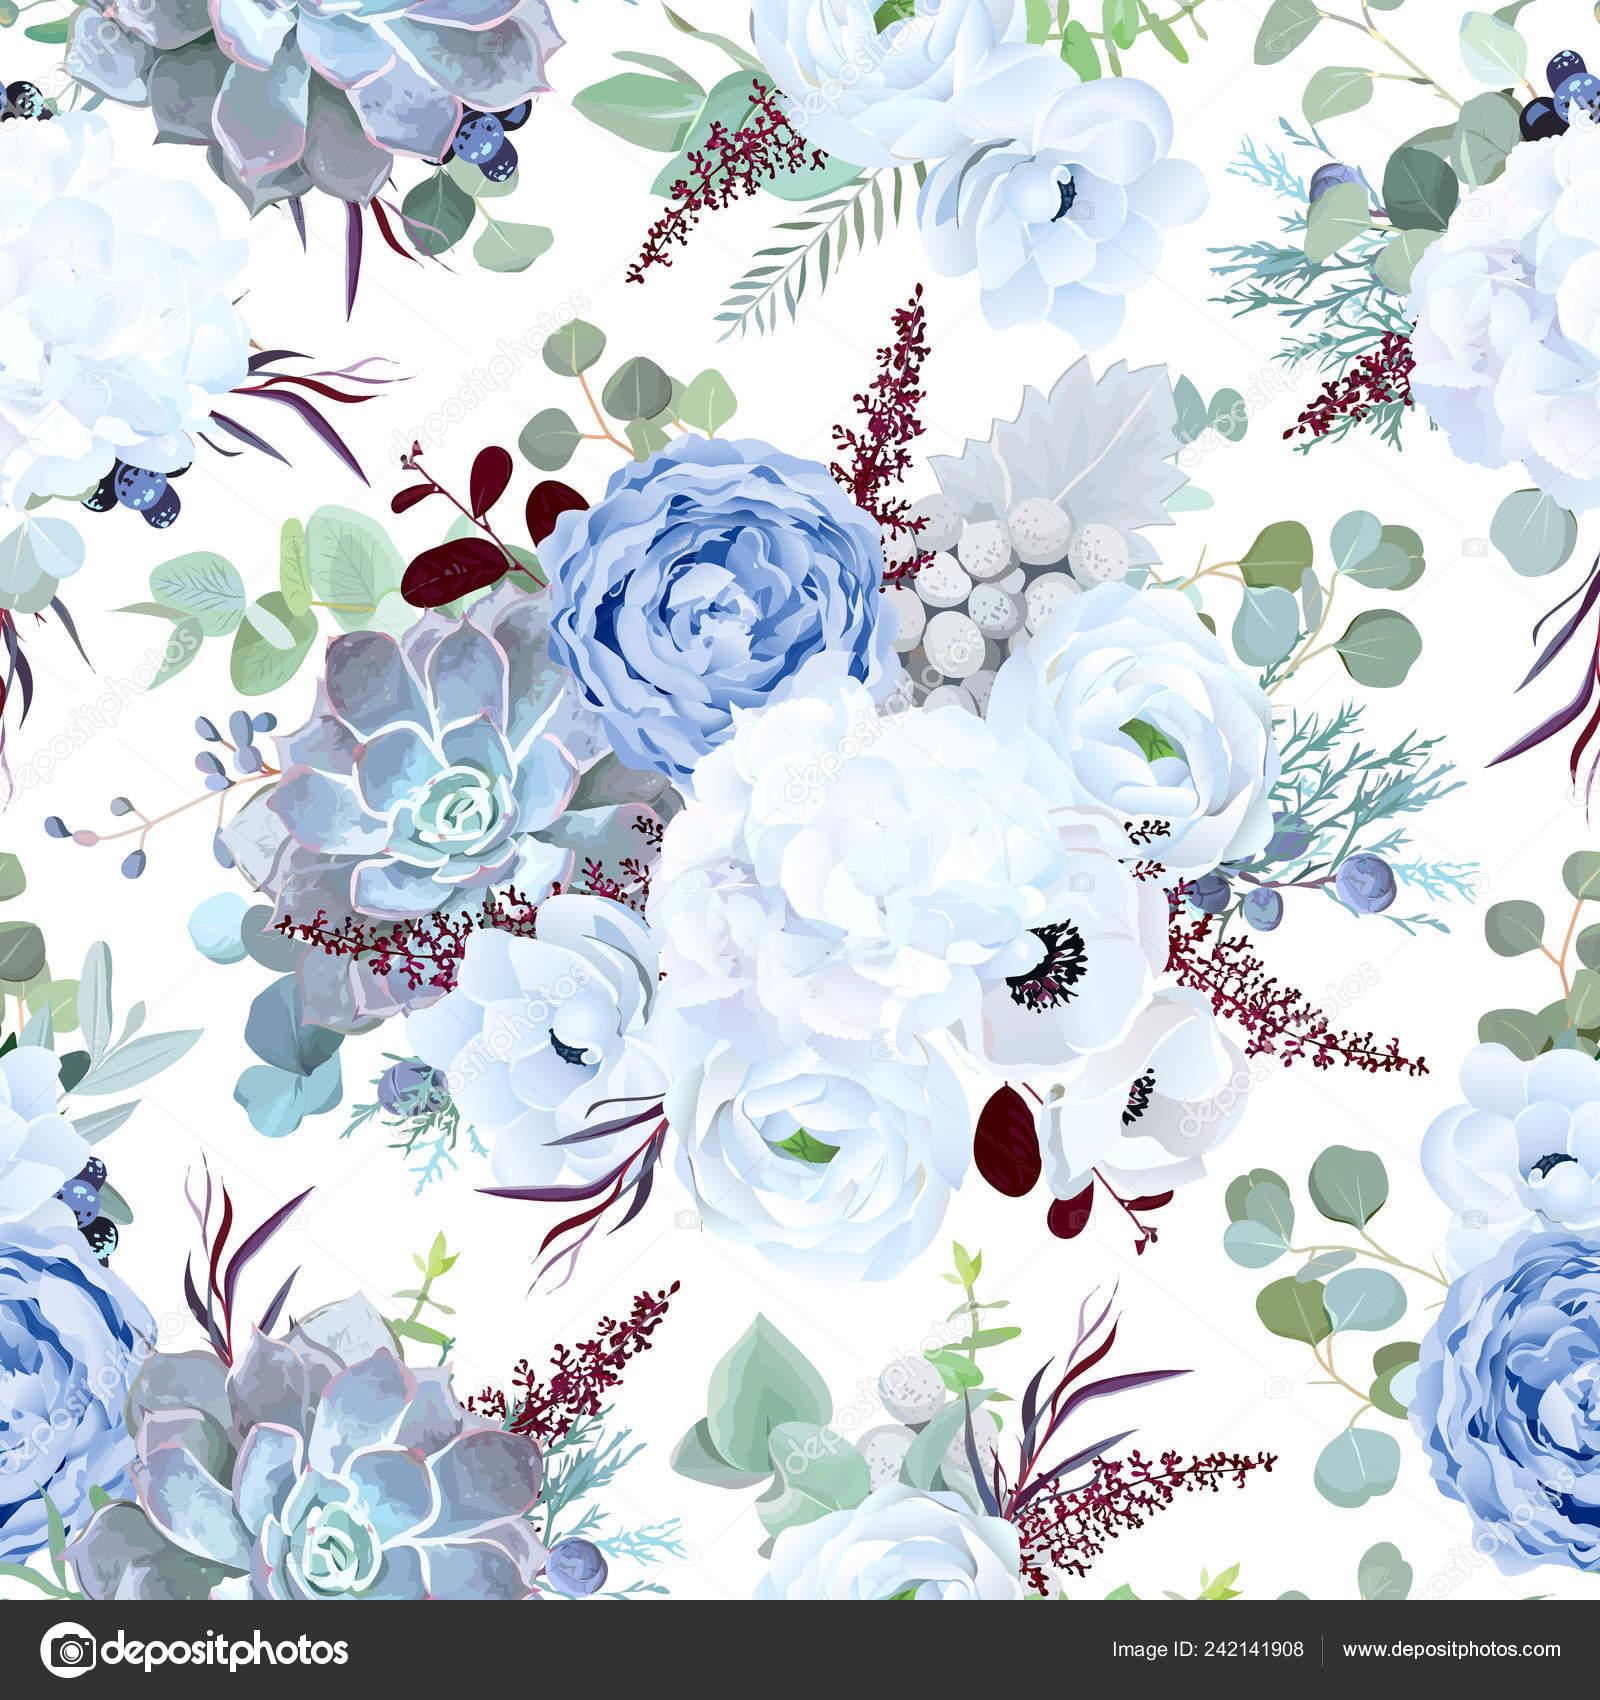 47842a4a3a54 Linda estampa floral — Vetores de Stock © lavendertime_ #242141908